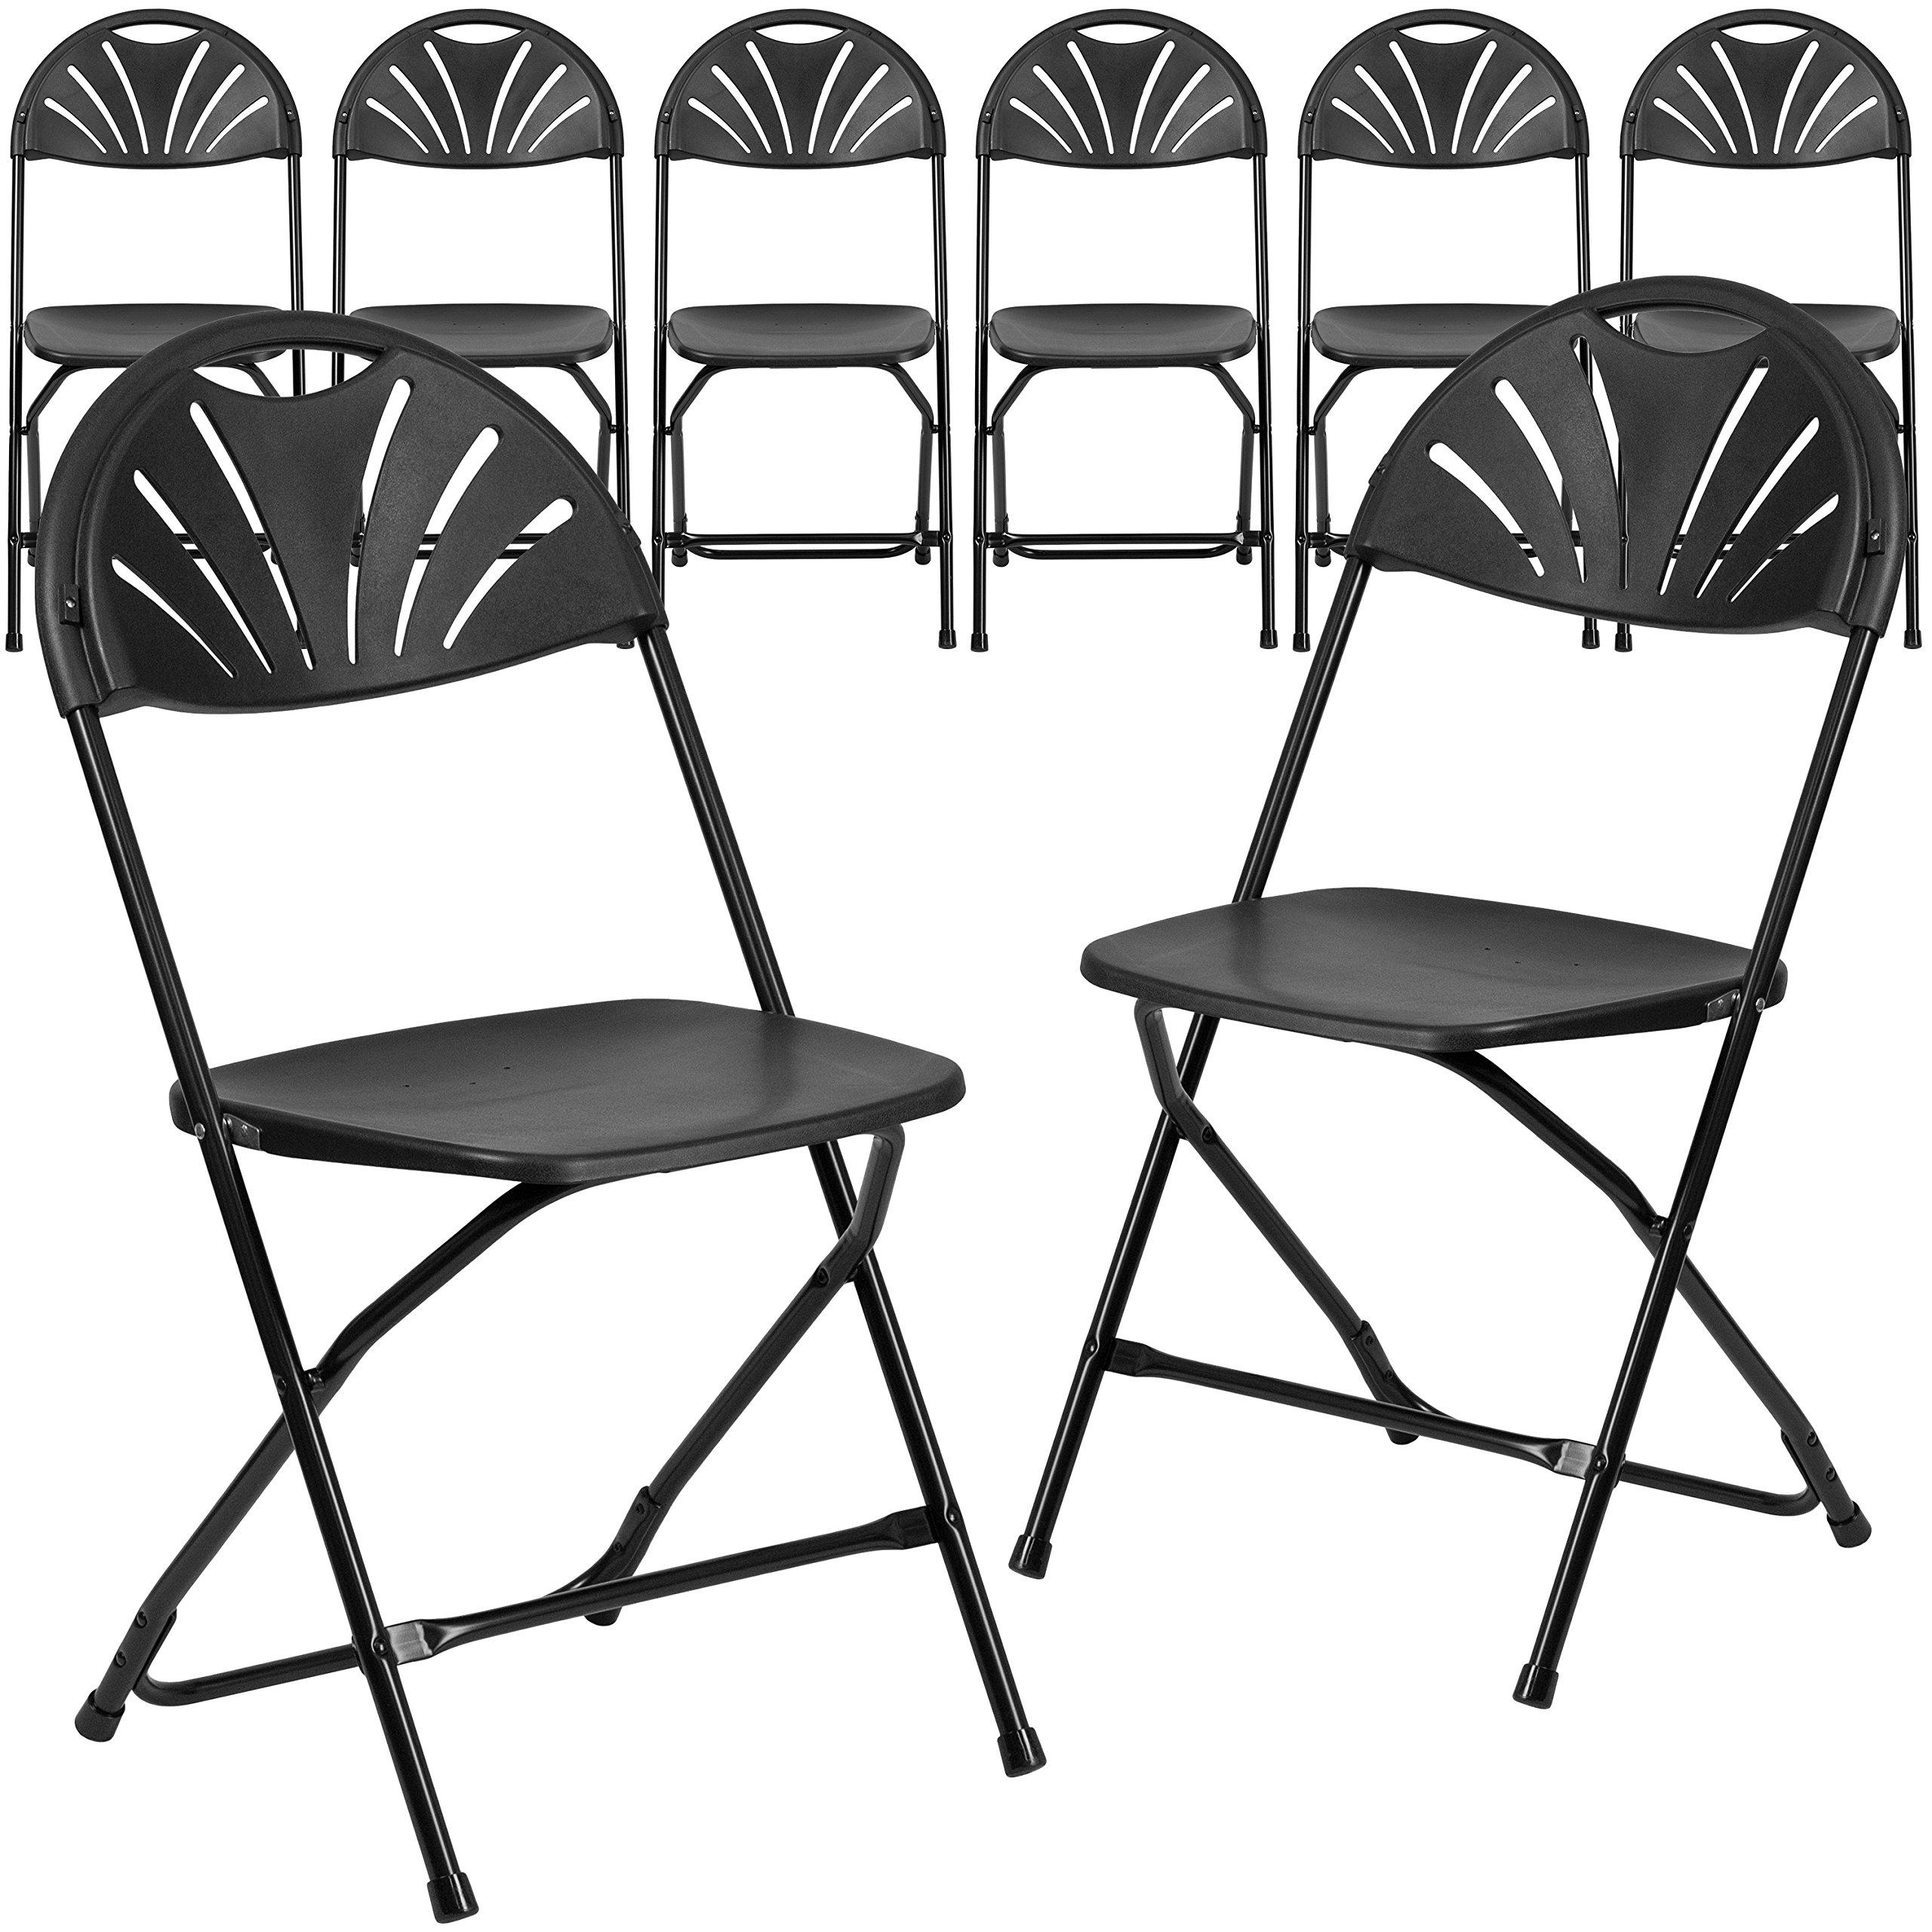 Flash Furniture 8 Pk. HERCULES Series 800 lb. Capacity Black Plastic Fan Back Folding Chair by Flash Furniture